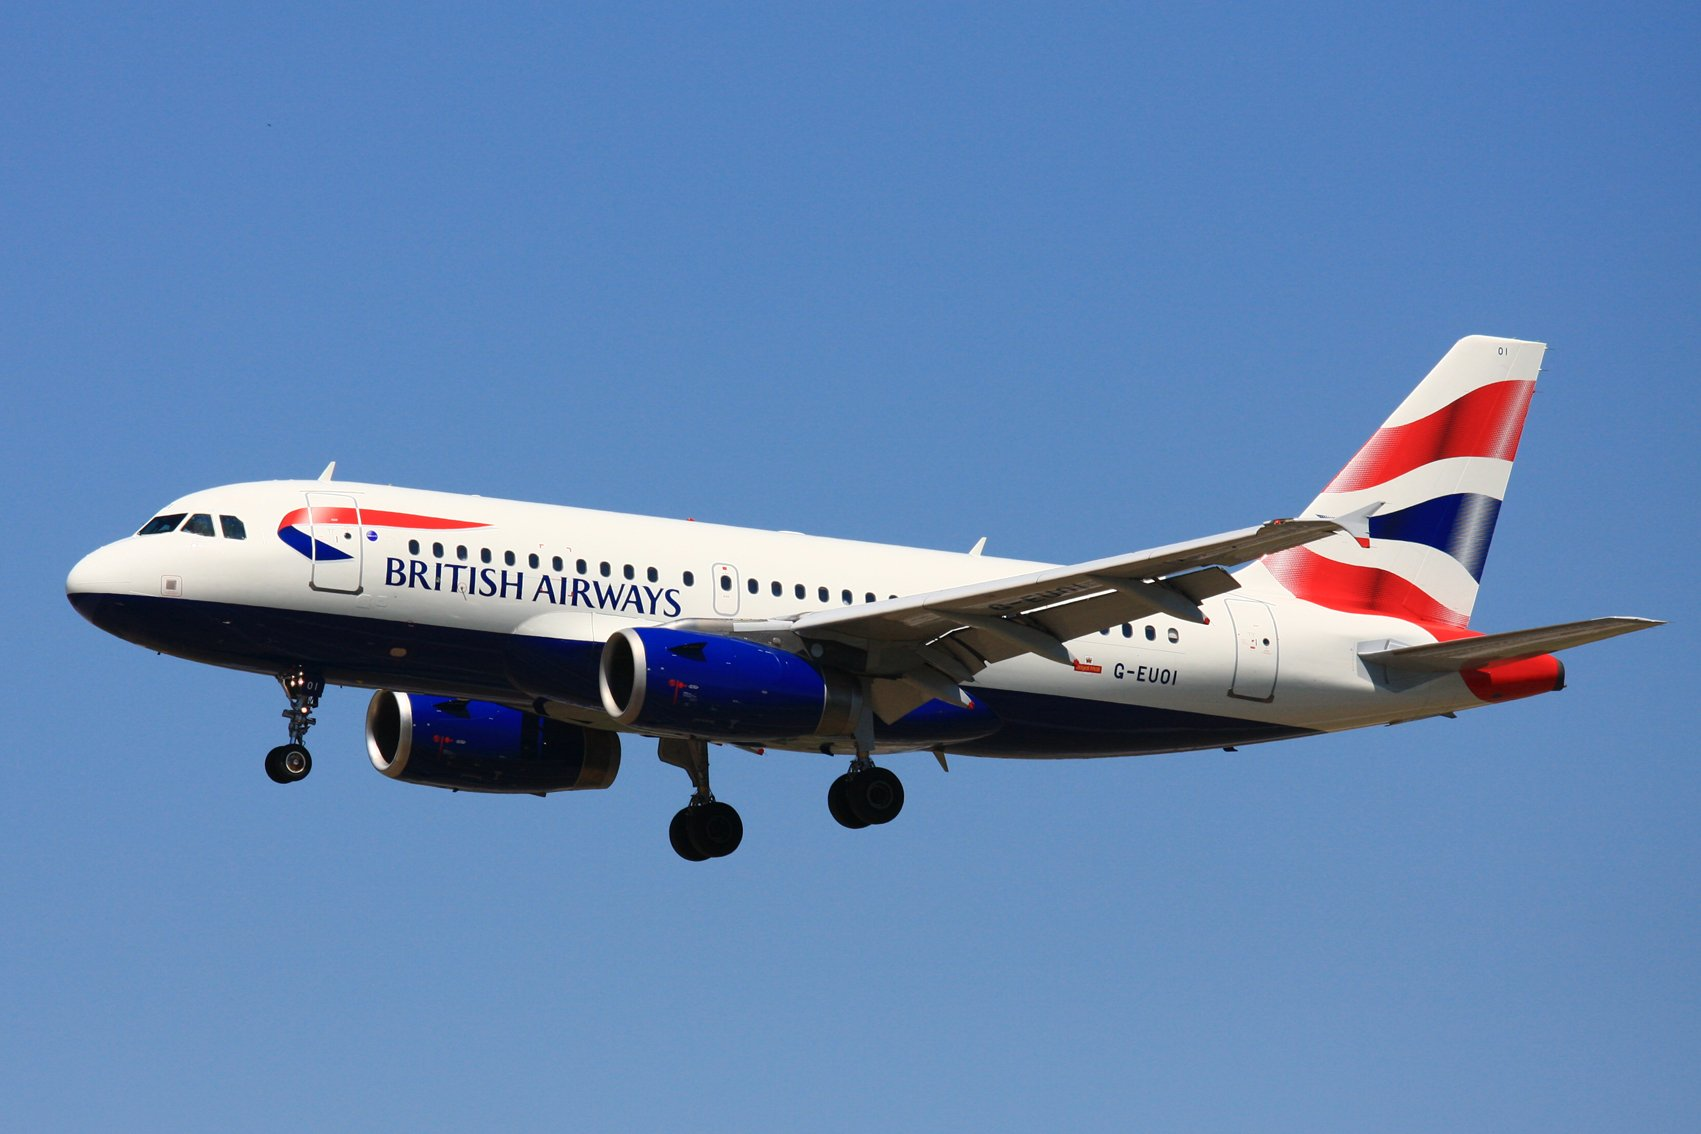 British Airways Cabin Crew Requirements | Cabin Crew Wings